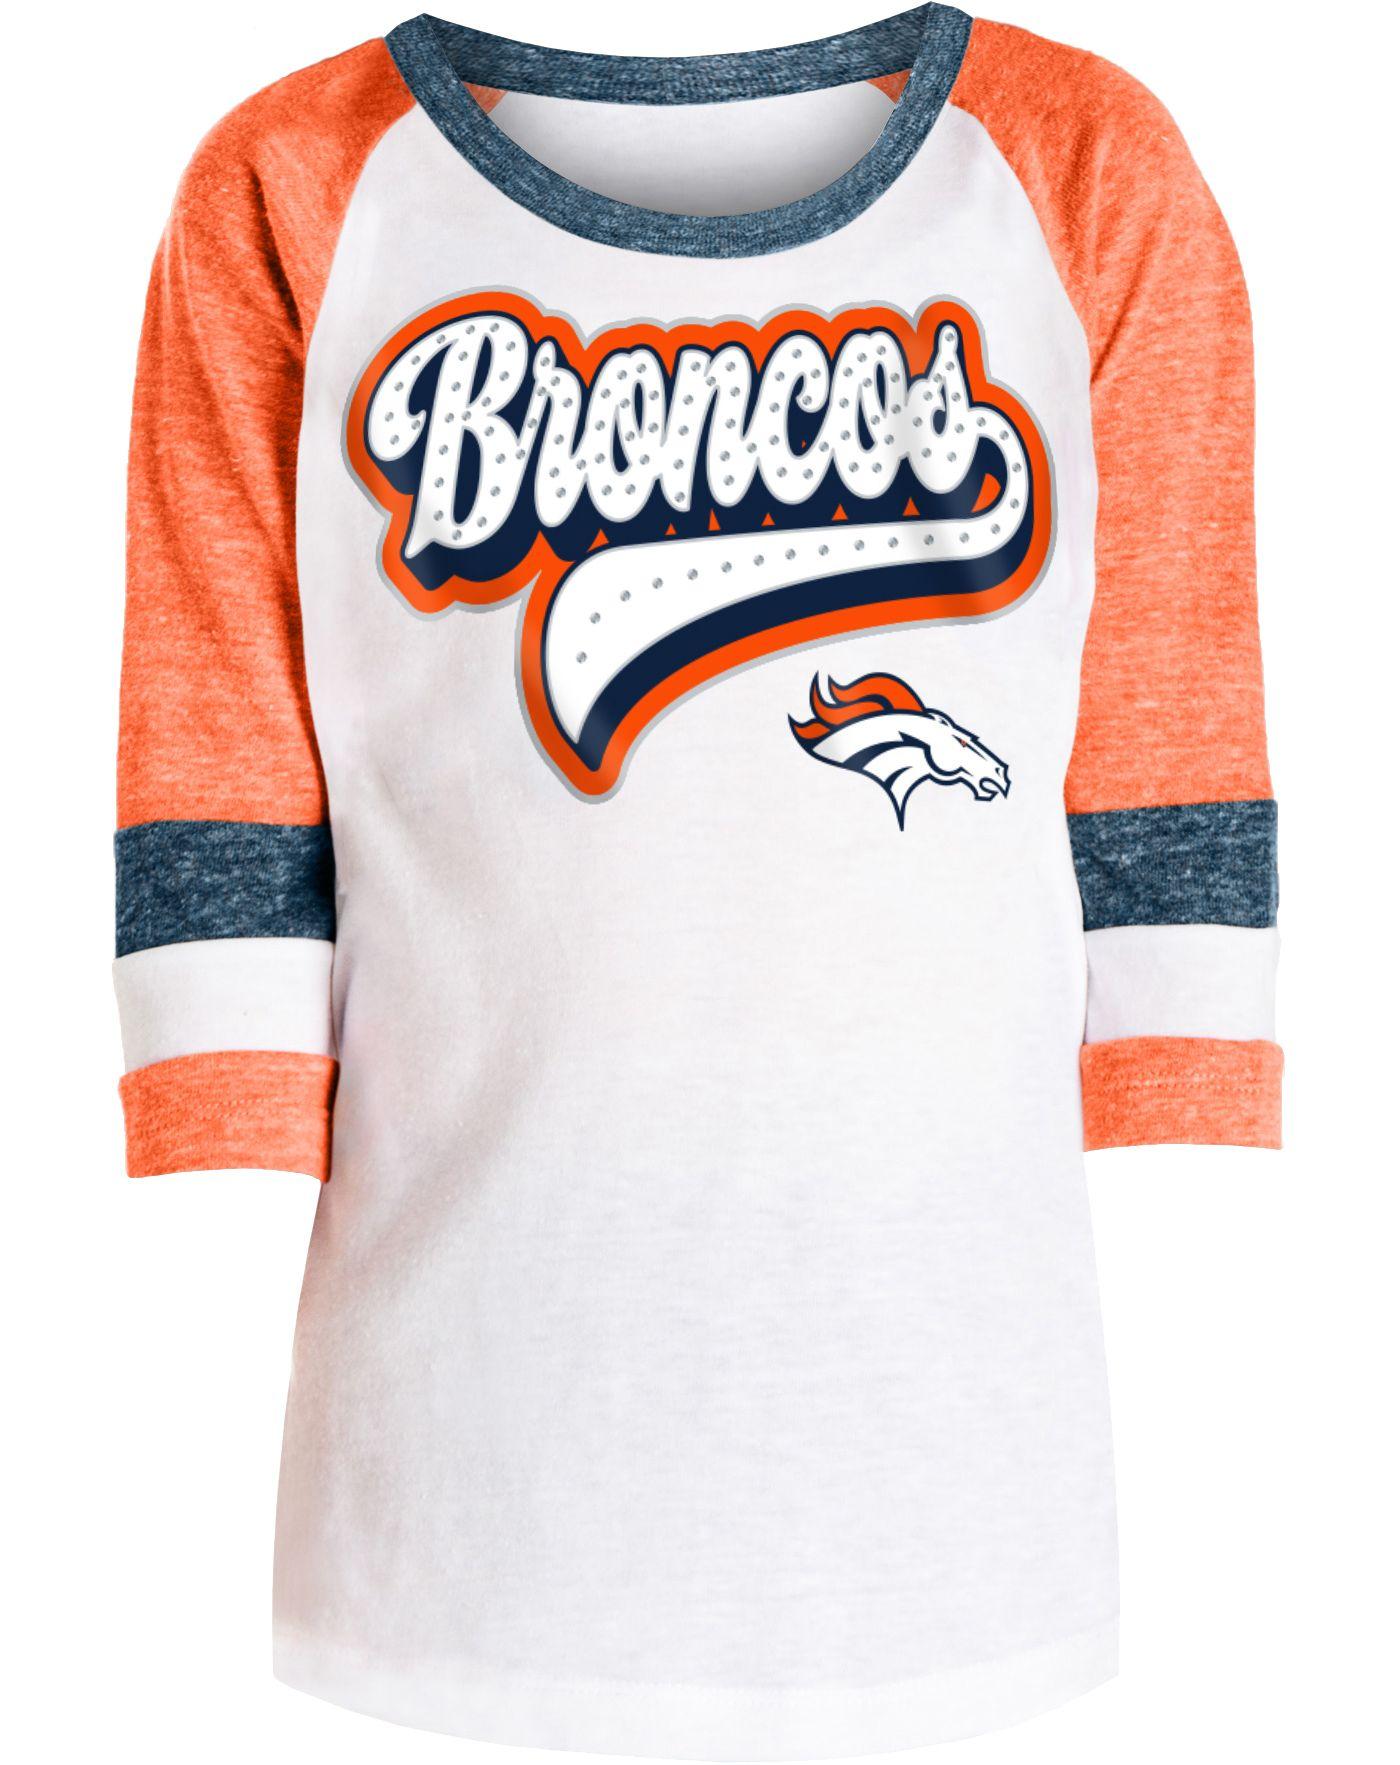 NFL Team Apparel Girls' Denver Broncos Rhinestone White Raglan T-Shirt